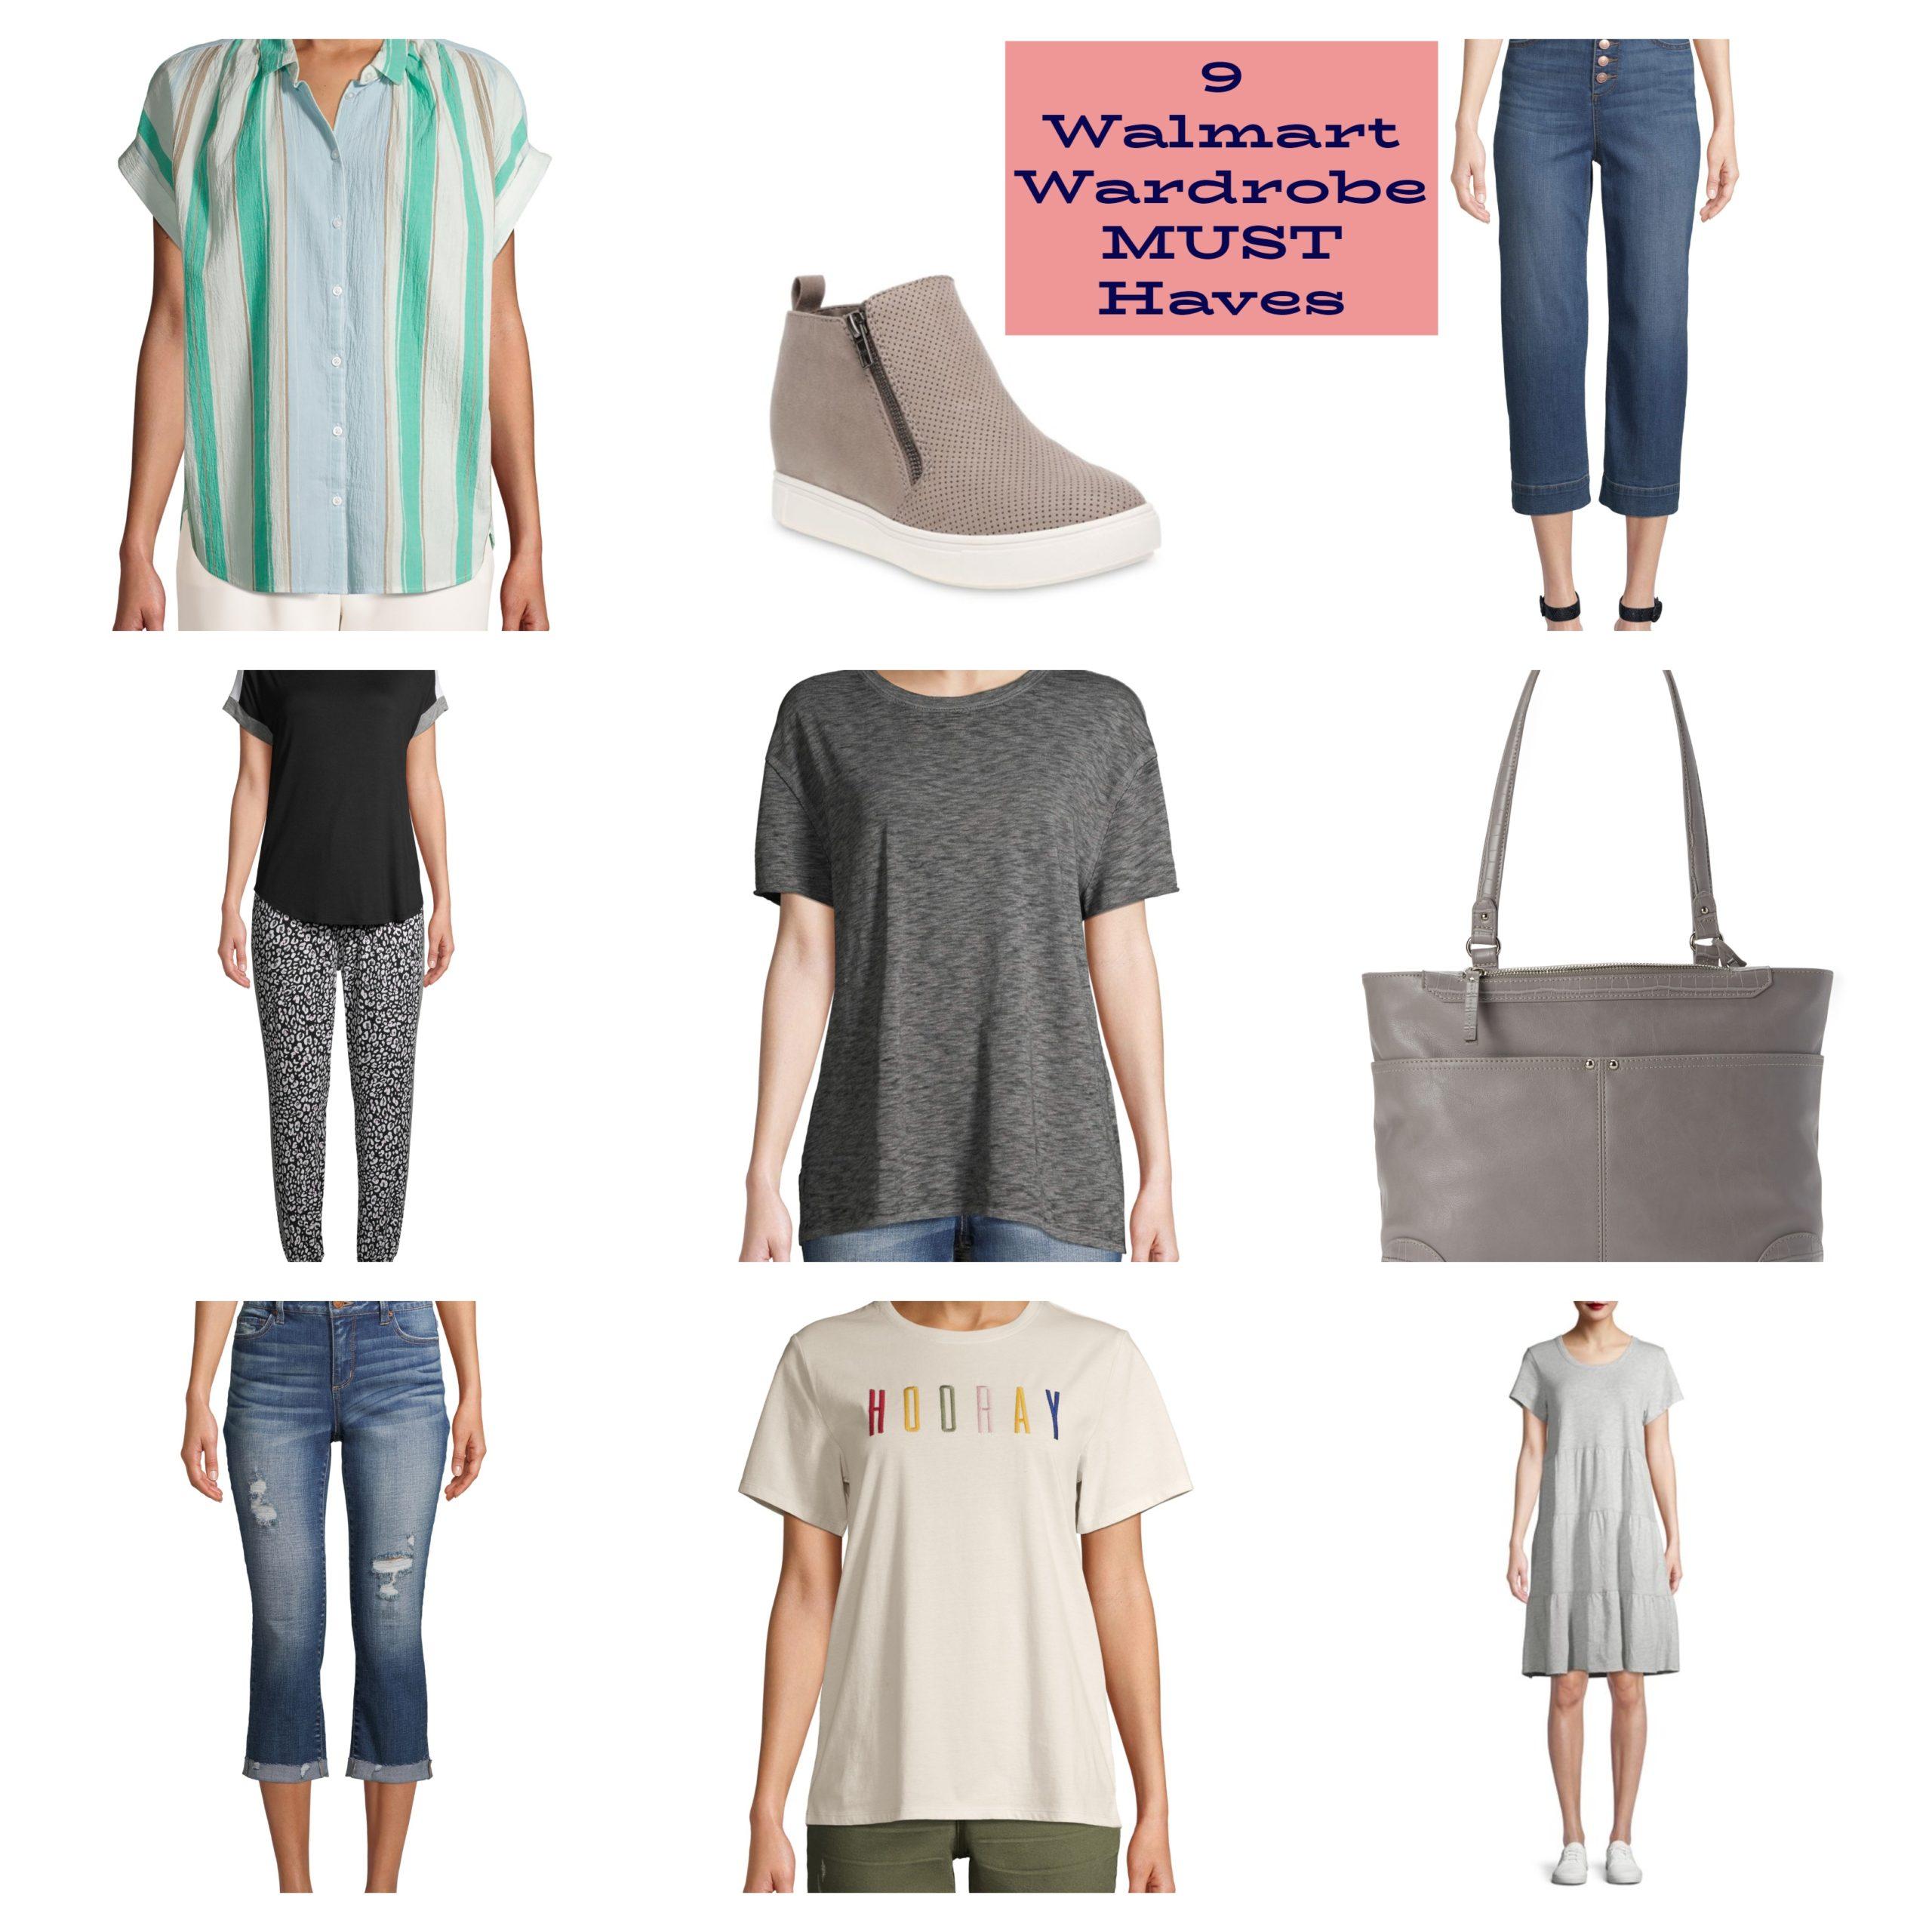 9 Walmart Wardrobe Additions That You MUST Snag!